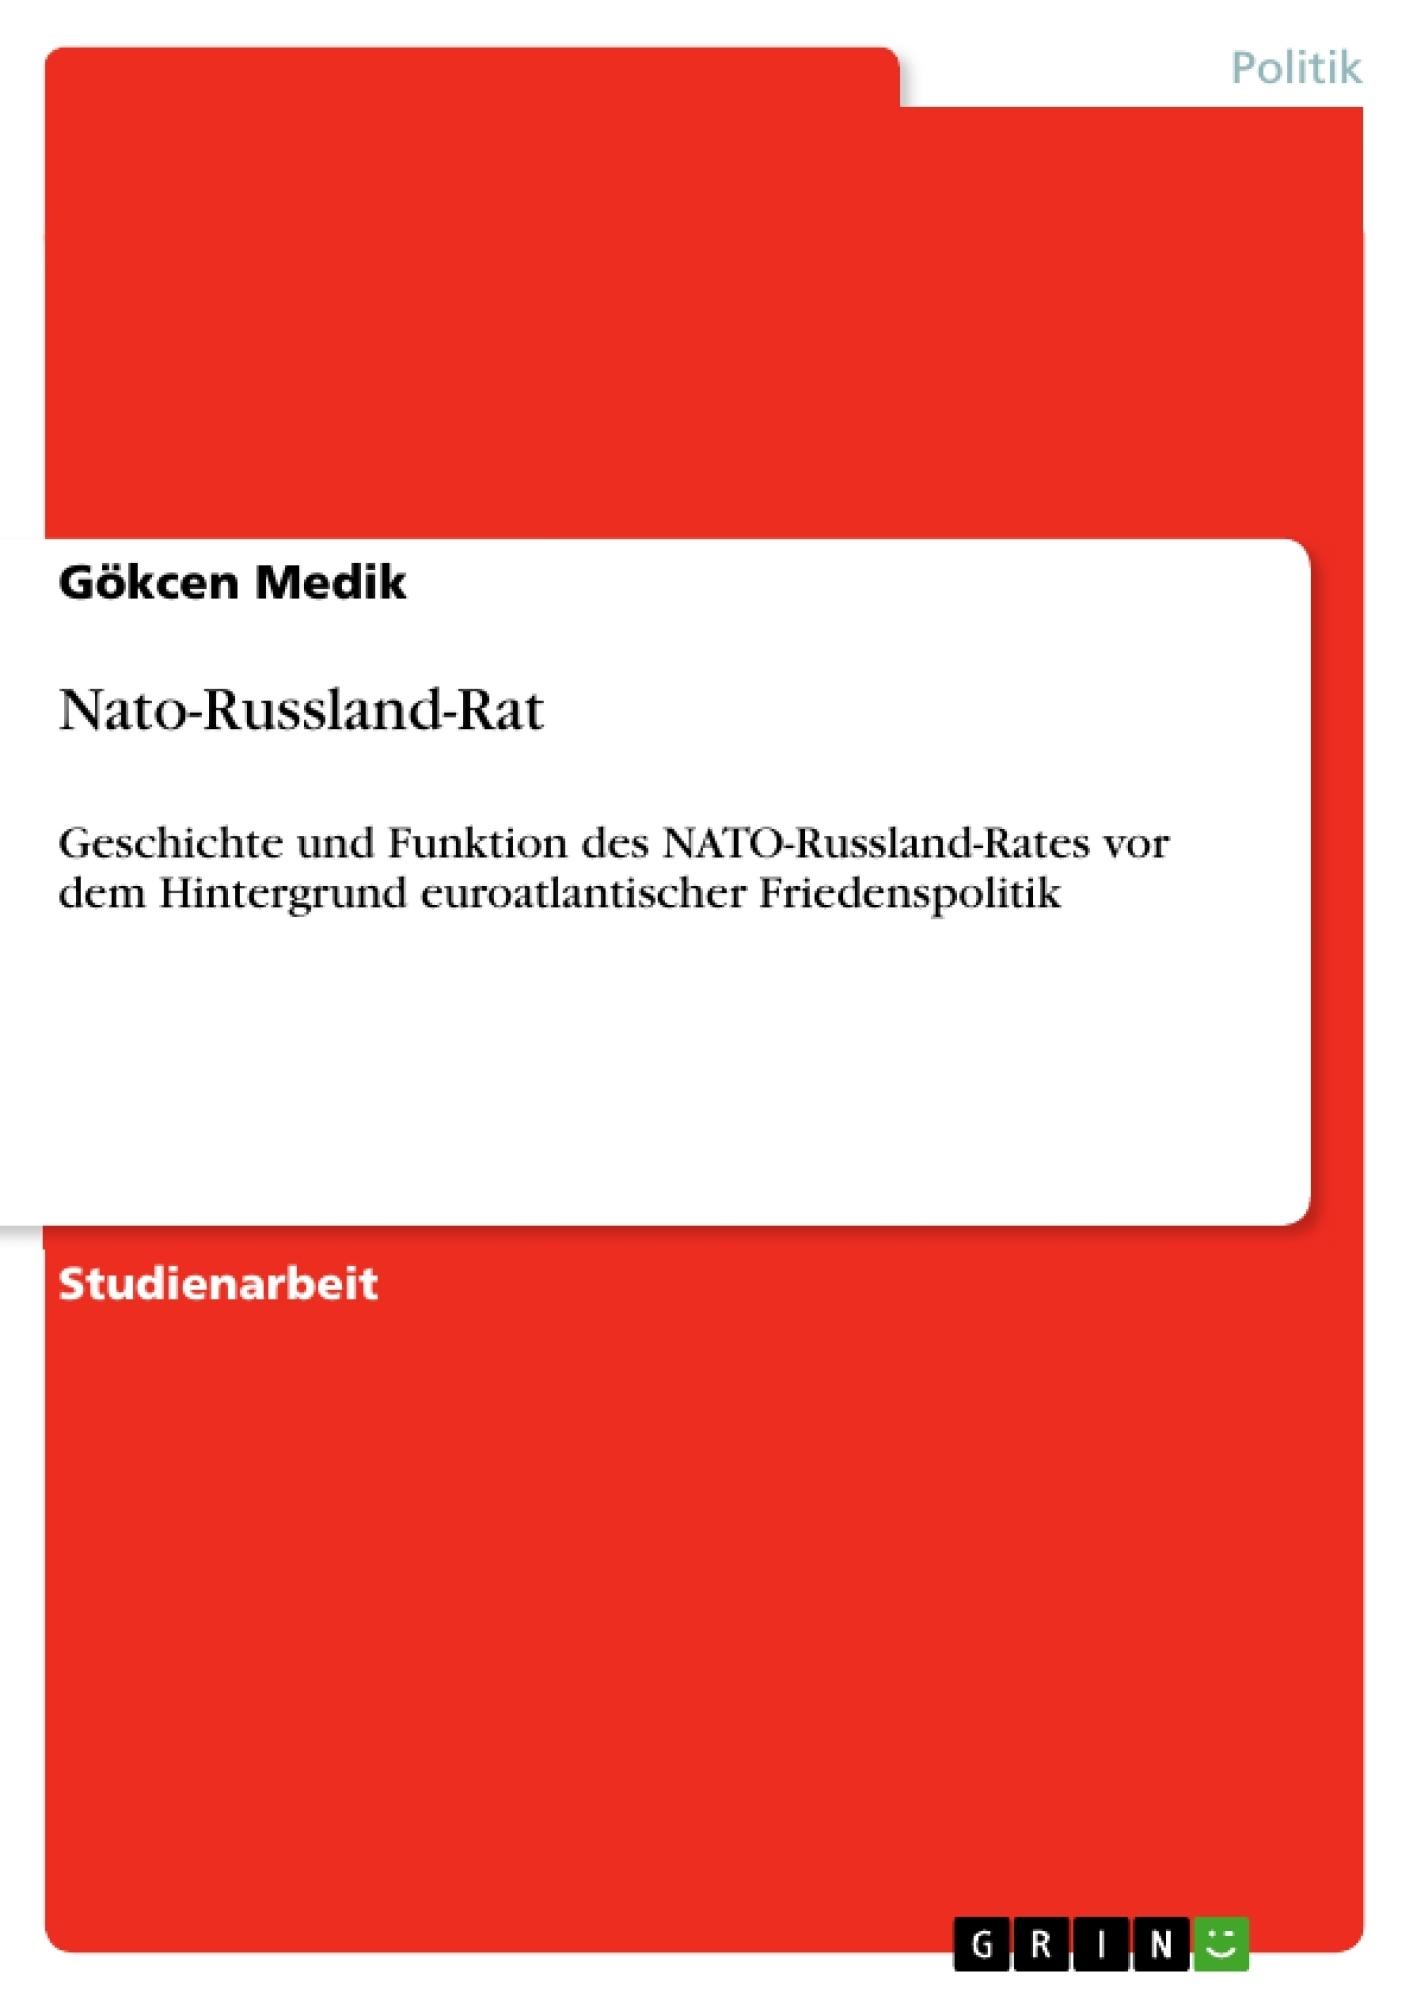 Titel: Nato-Russland-Rat